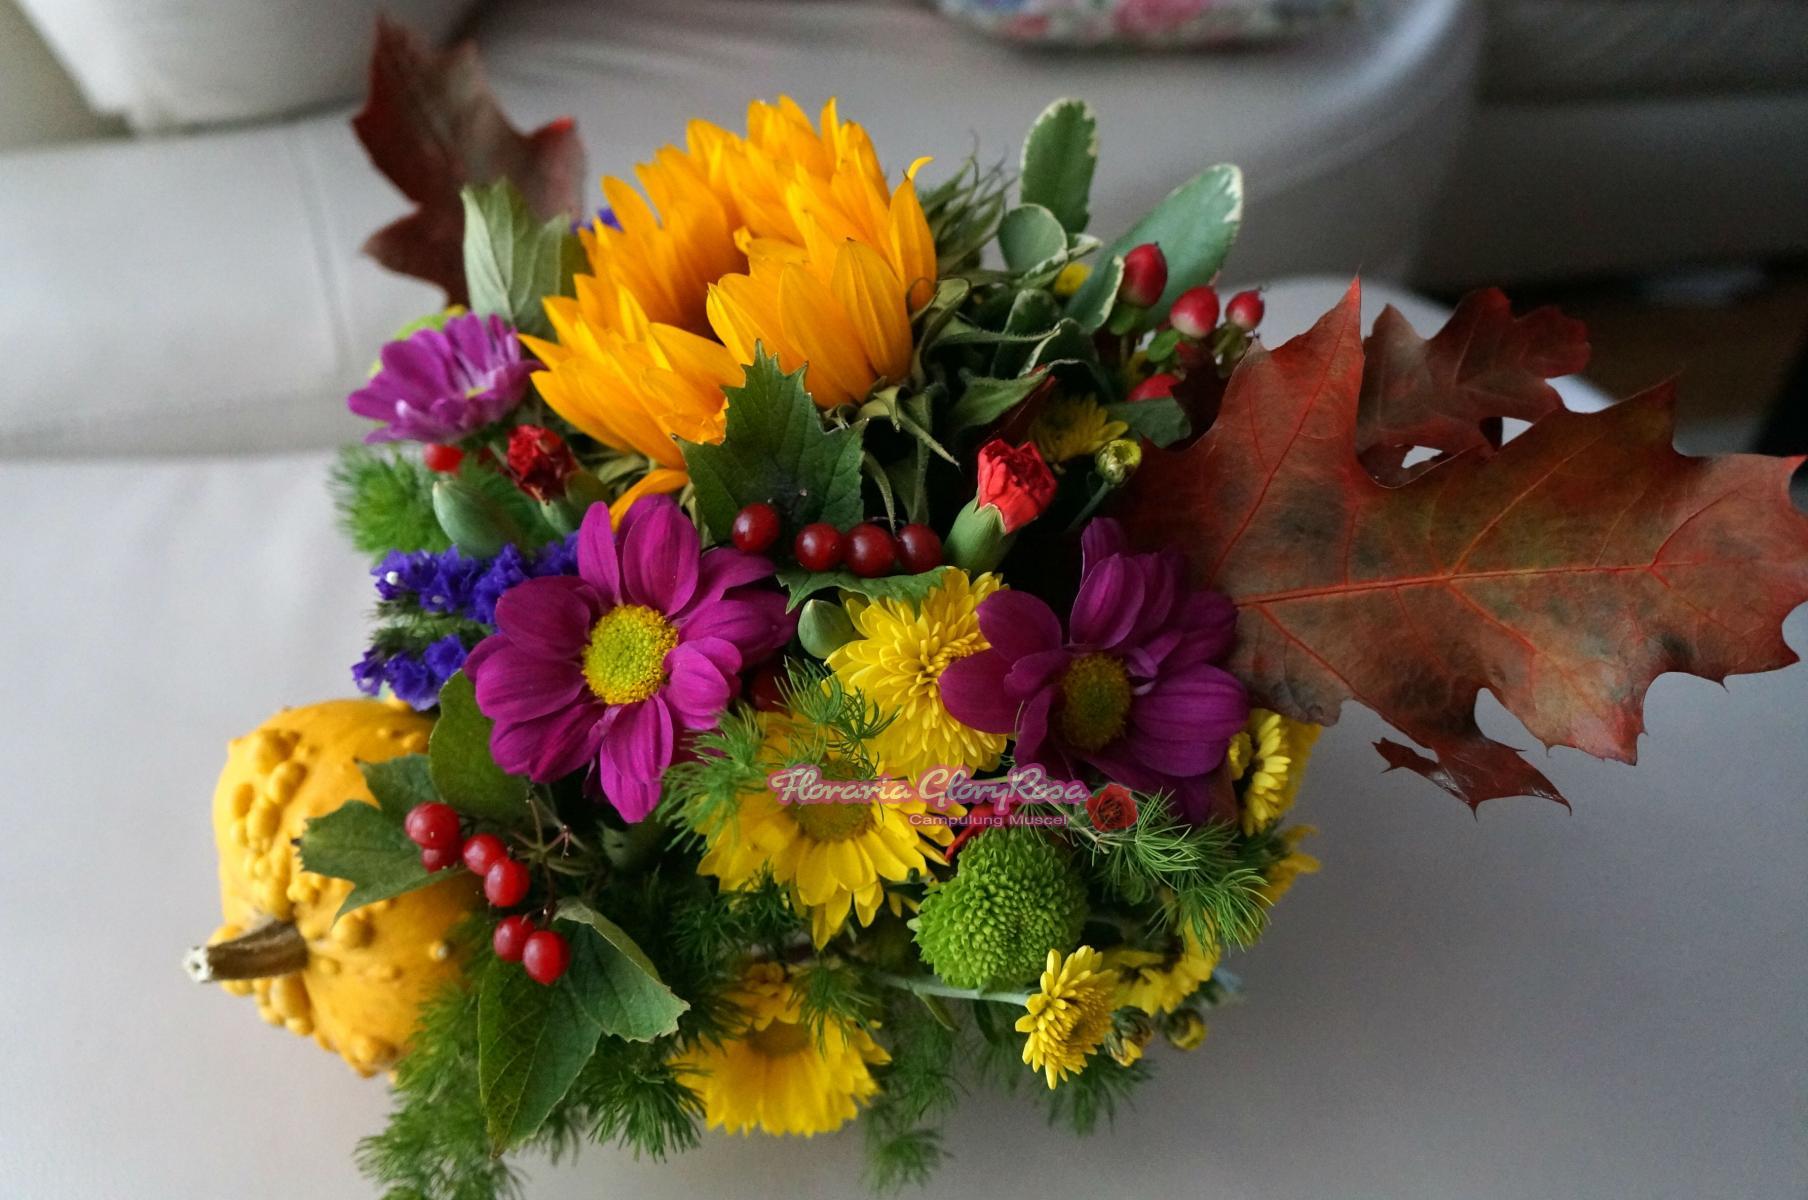 Floraria Gloryrosa Livrari Flori Si Aranjamente Florale In